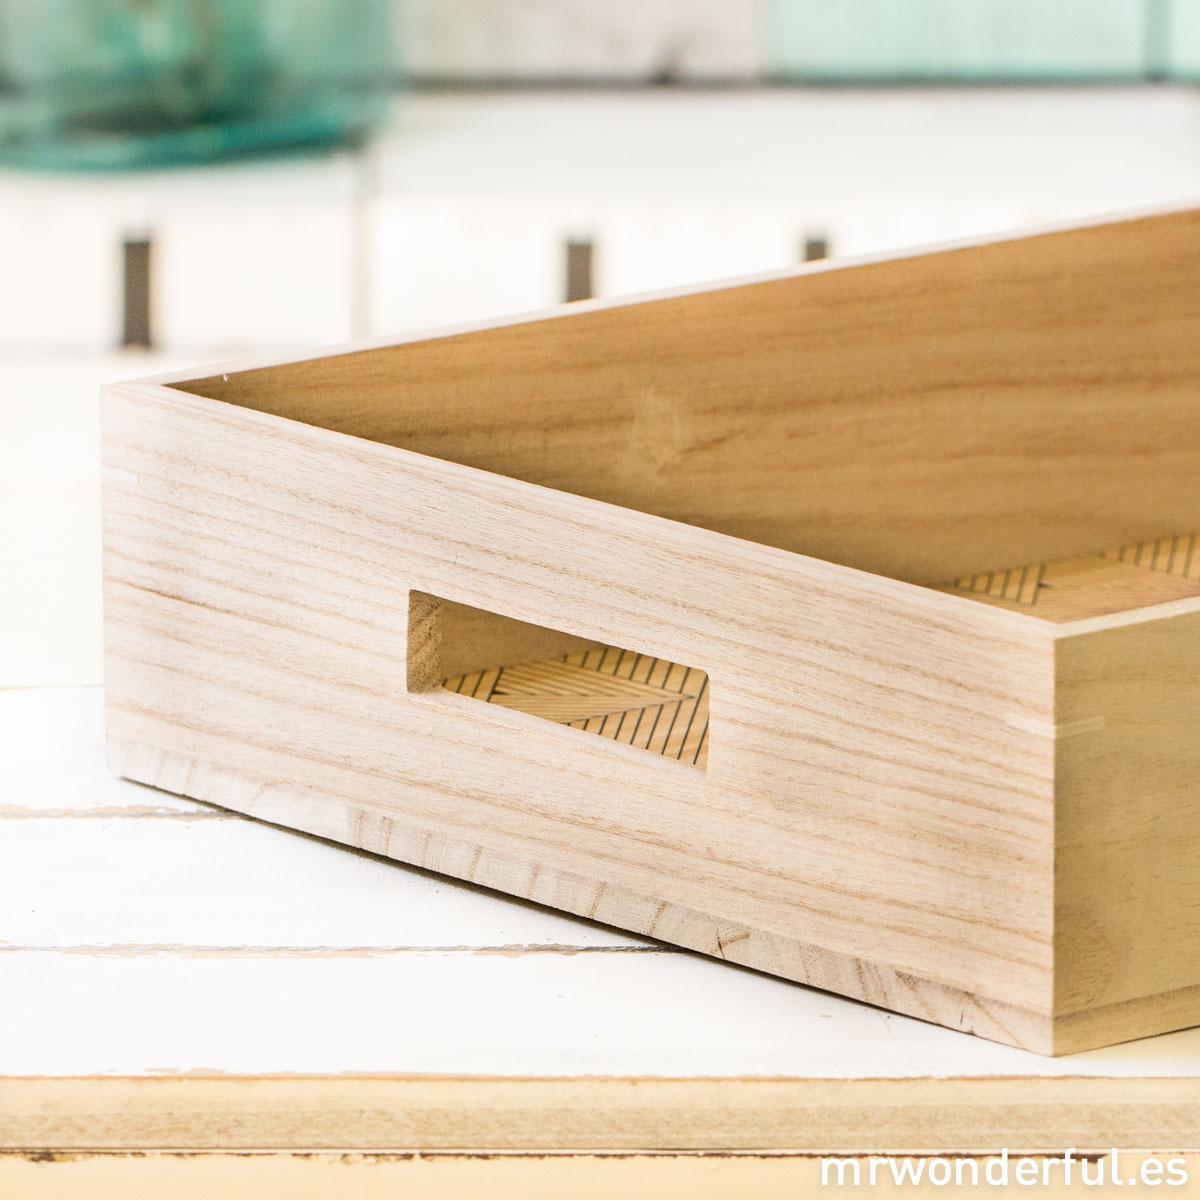 mrwonderful_SU0242_2_bandeja-grande-madera_base-estampado-geometrico-6